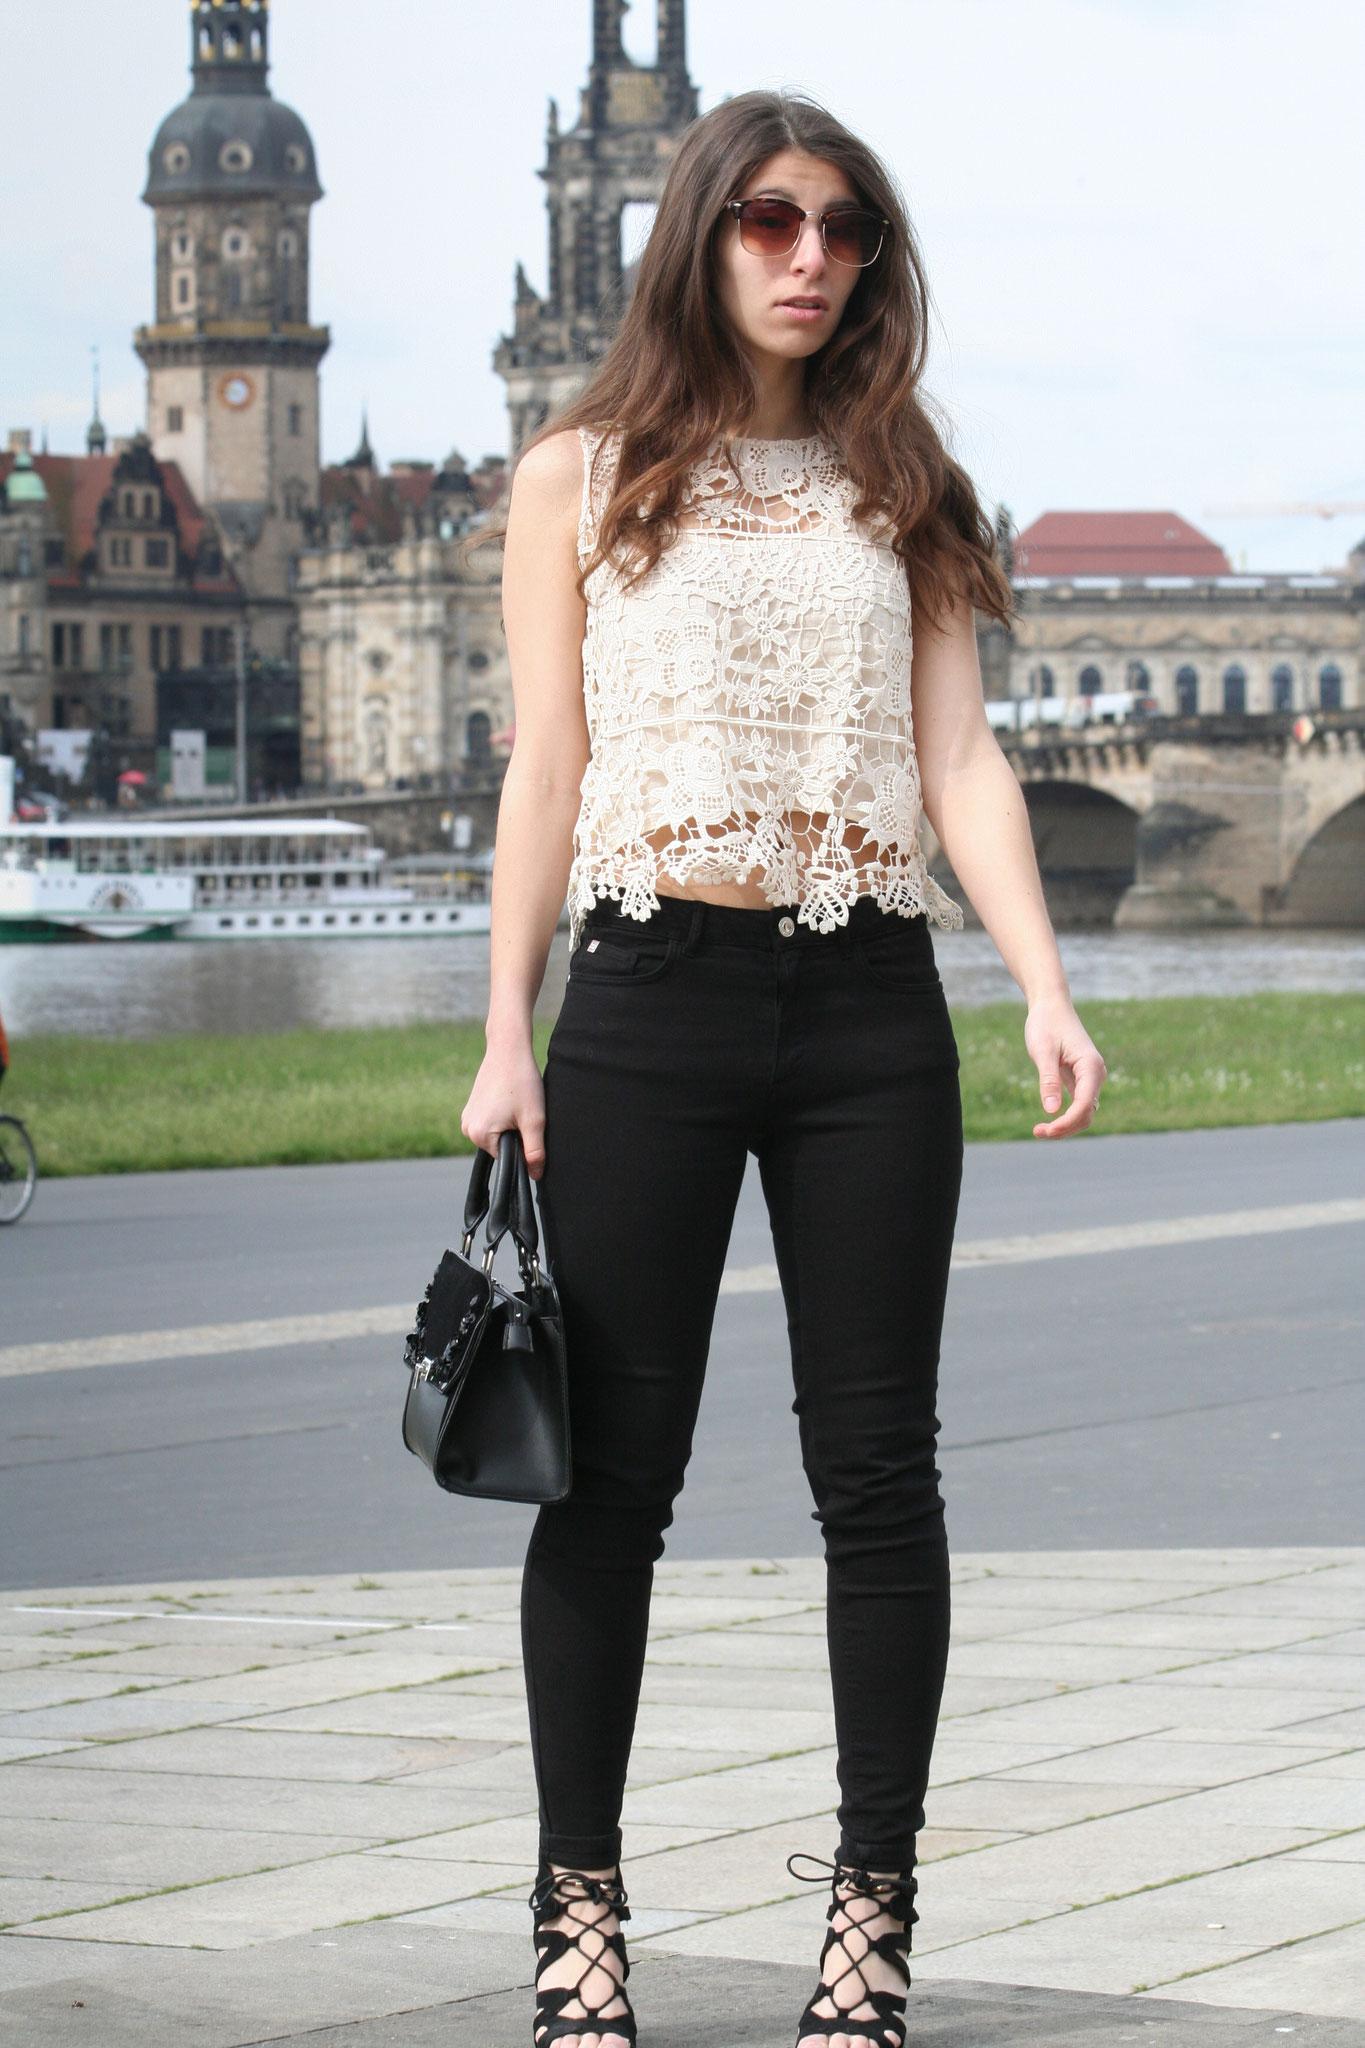 Spitzentop Spitzenoberteil Zara Modeblog Carmen Schubert Modeblog Deutschland